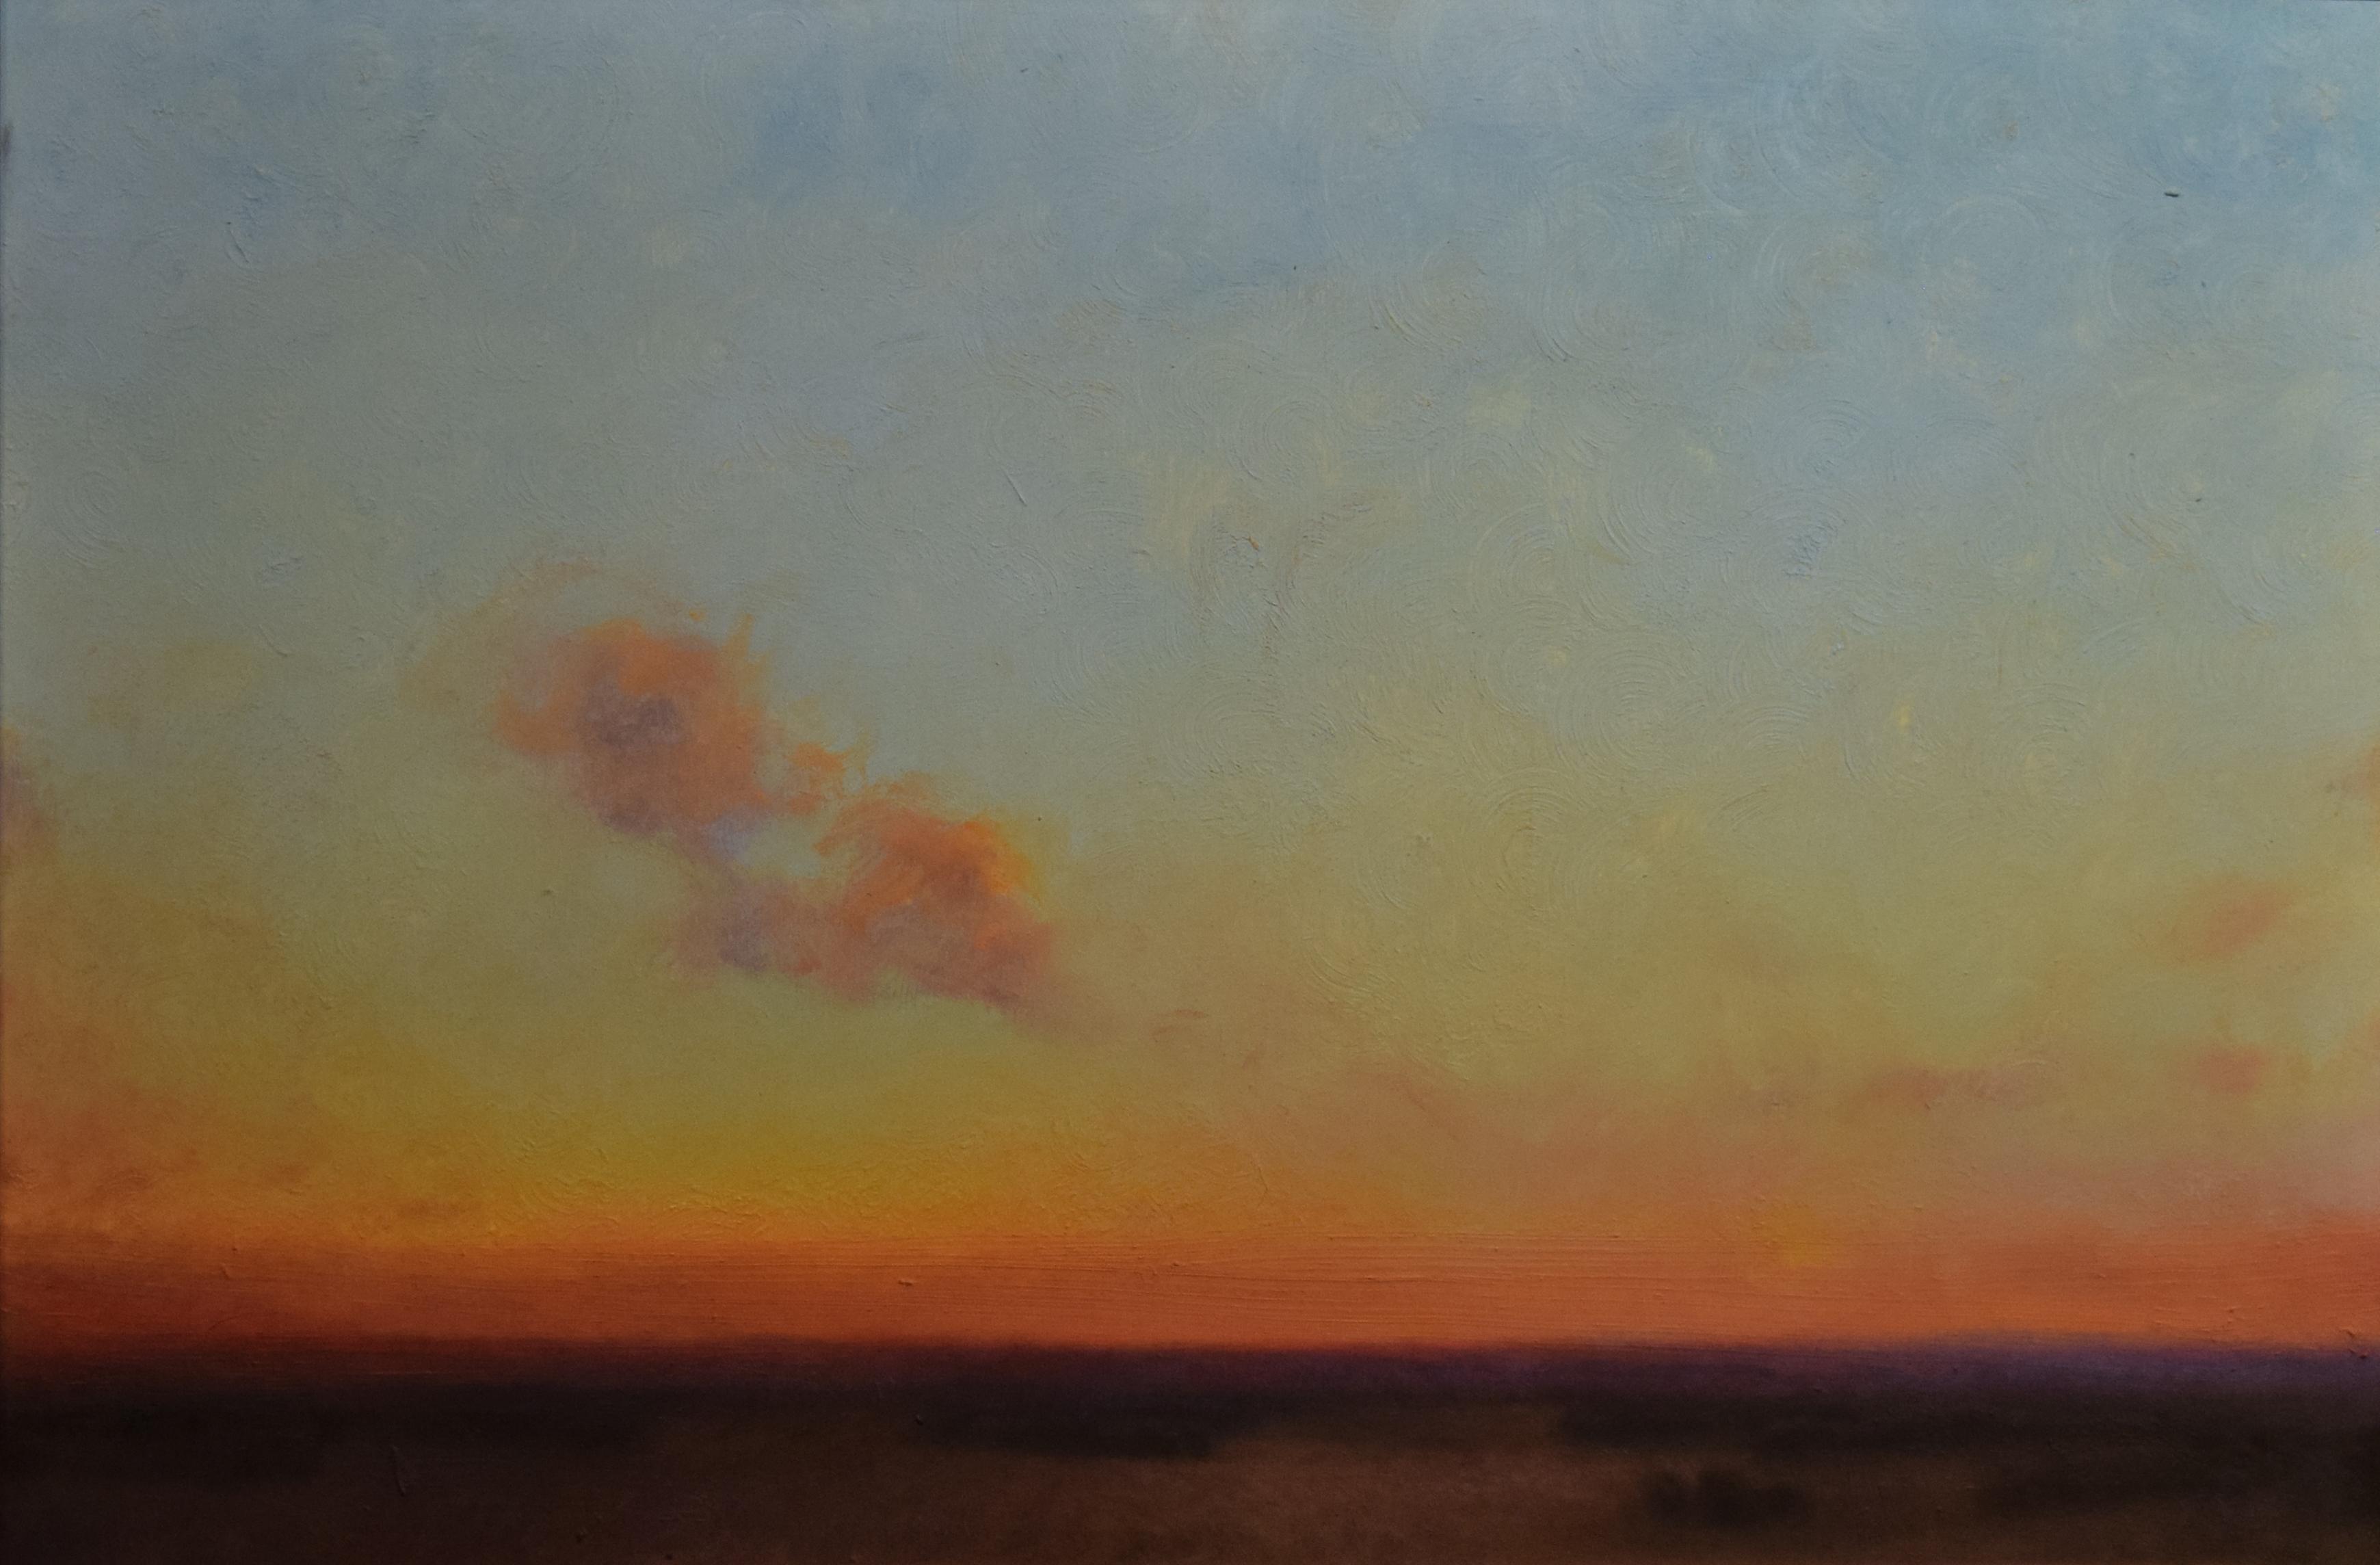 Sunset Series #2